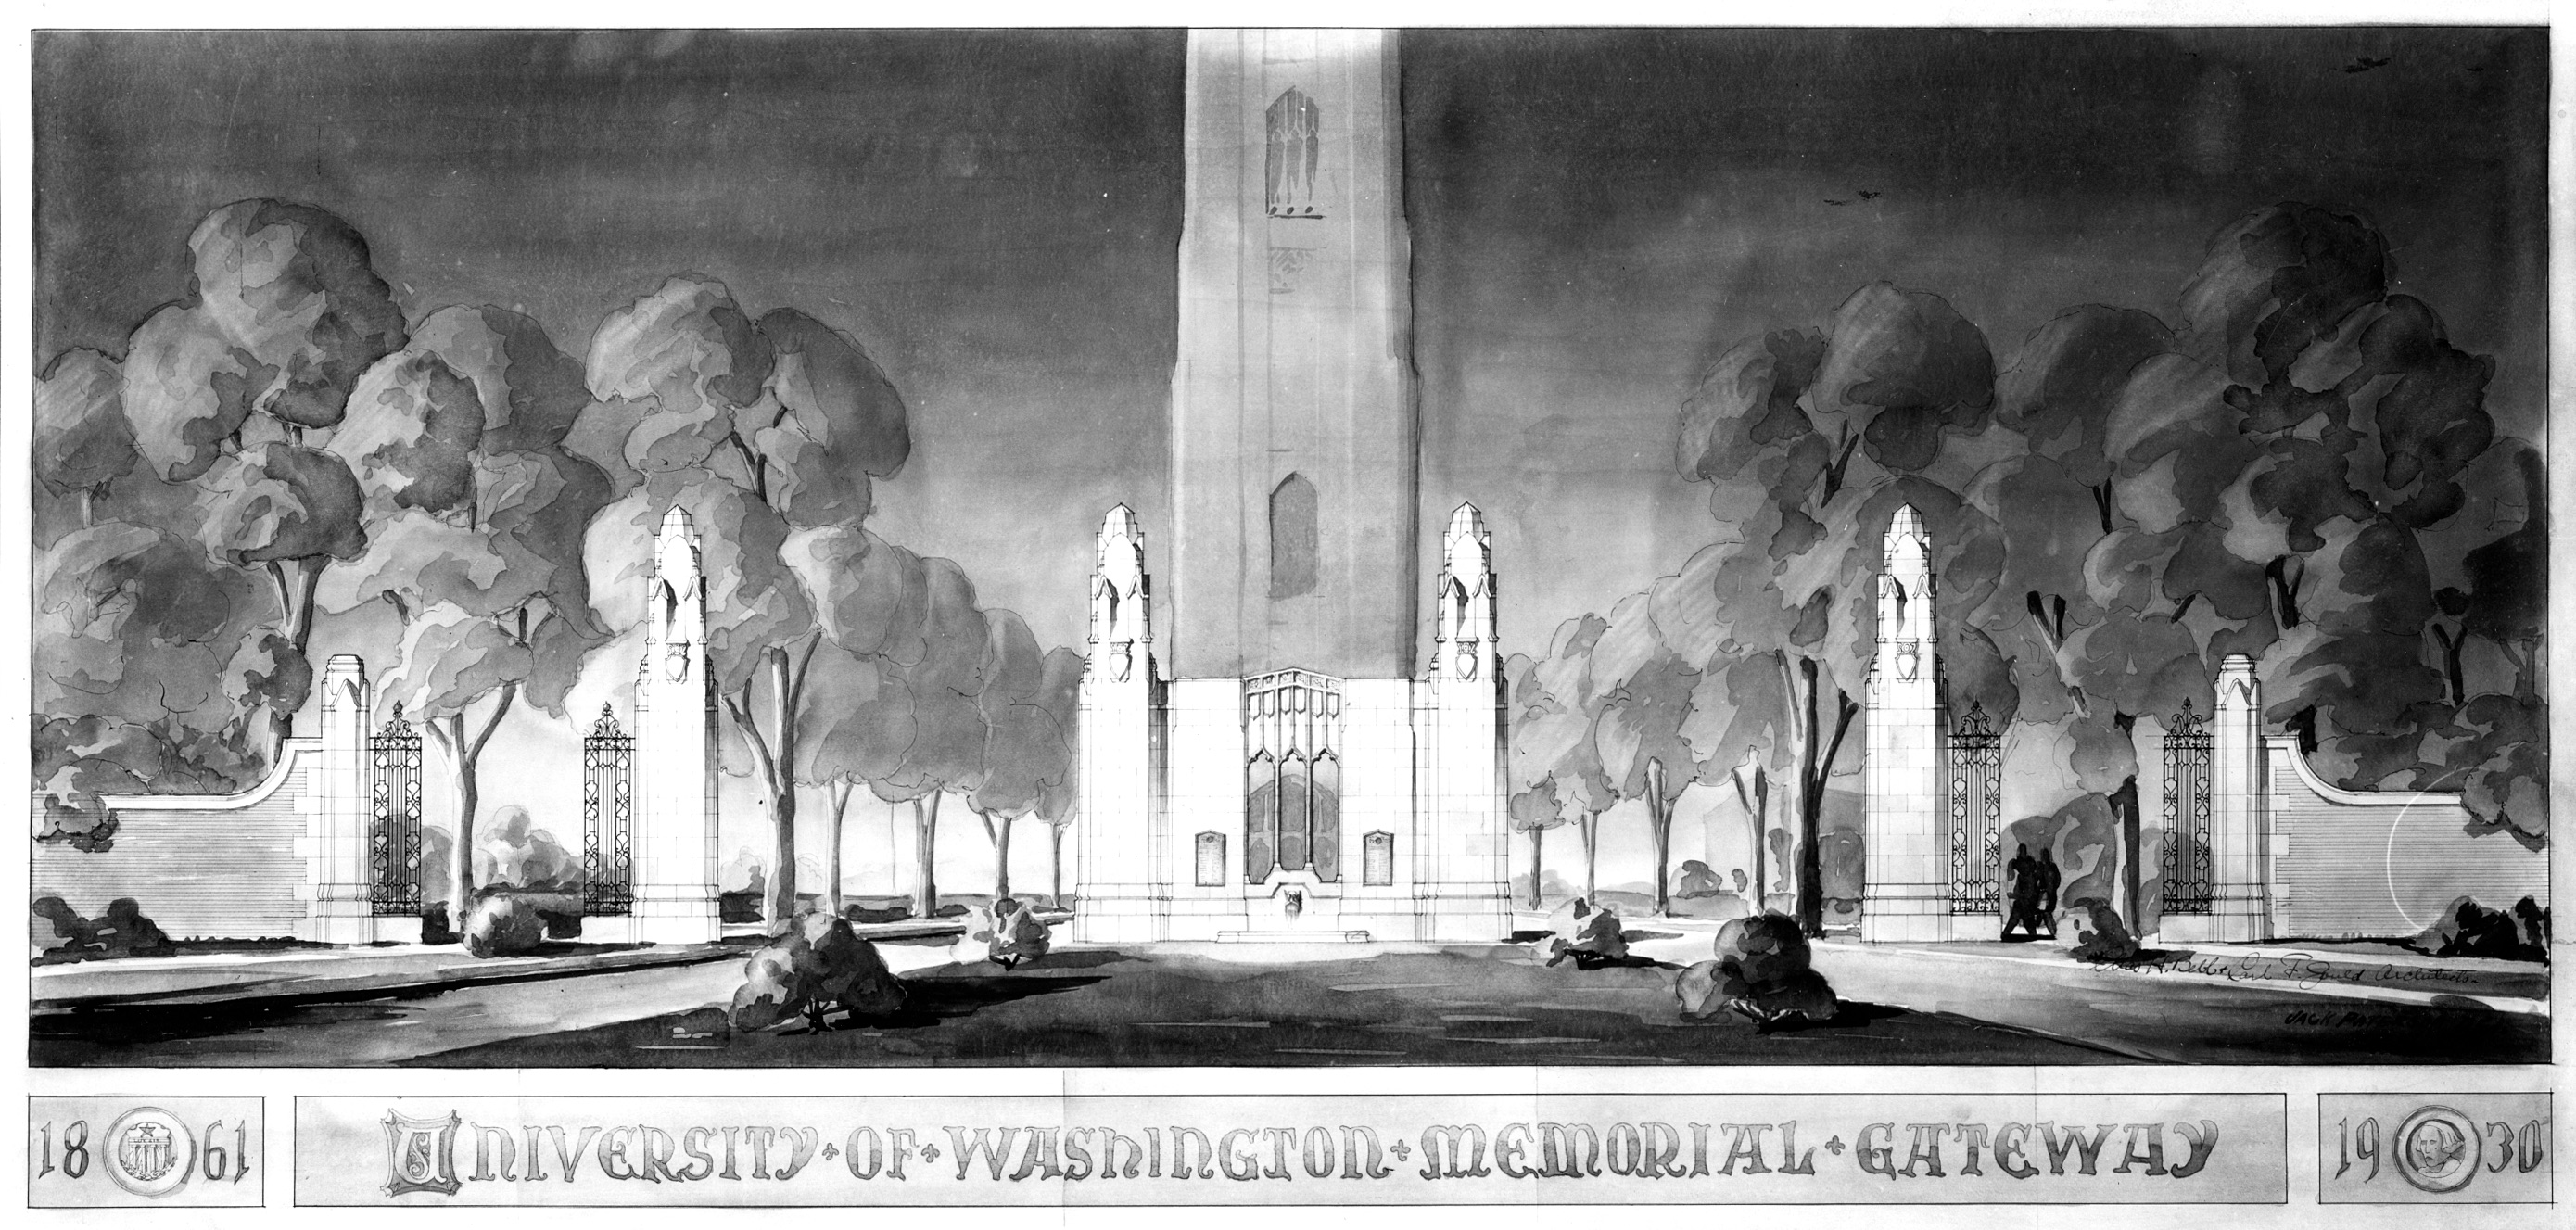 University of Washington in World War I – Student Veteran Life